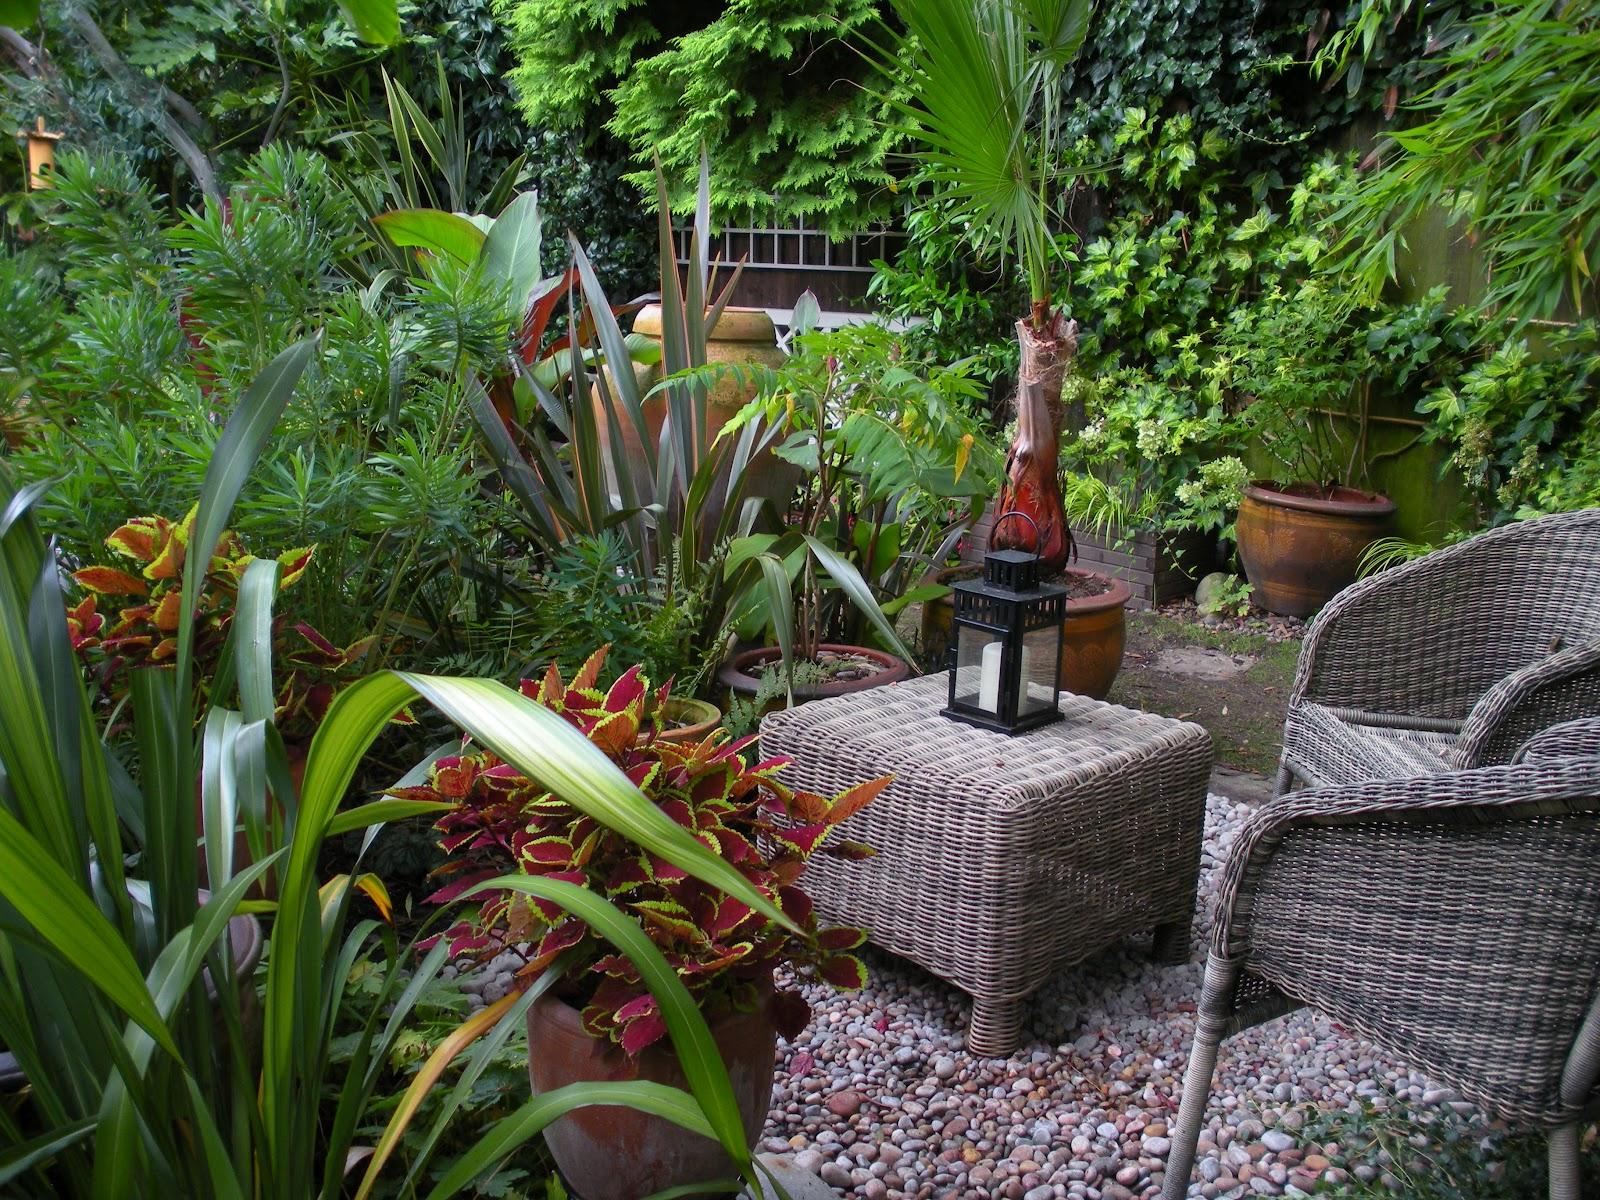 victoria u0027s backyard you know it u0027s garden open day when